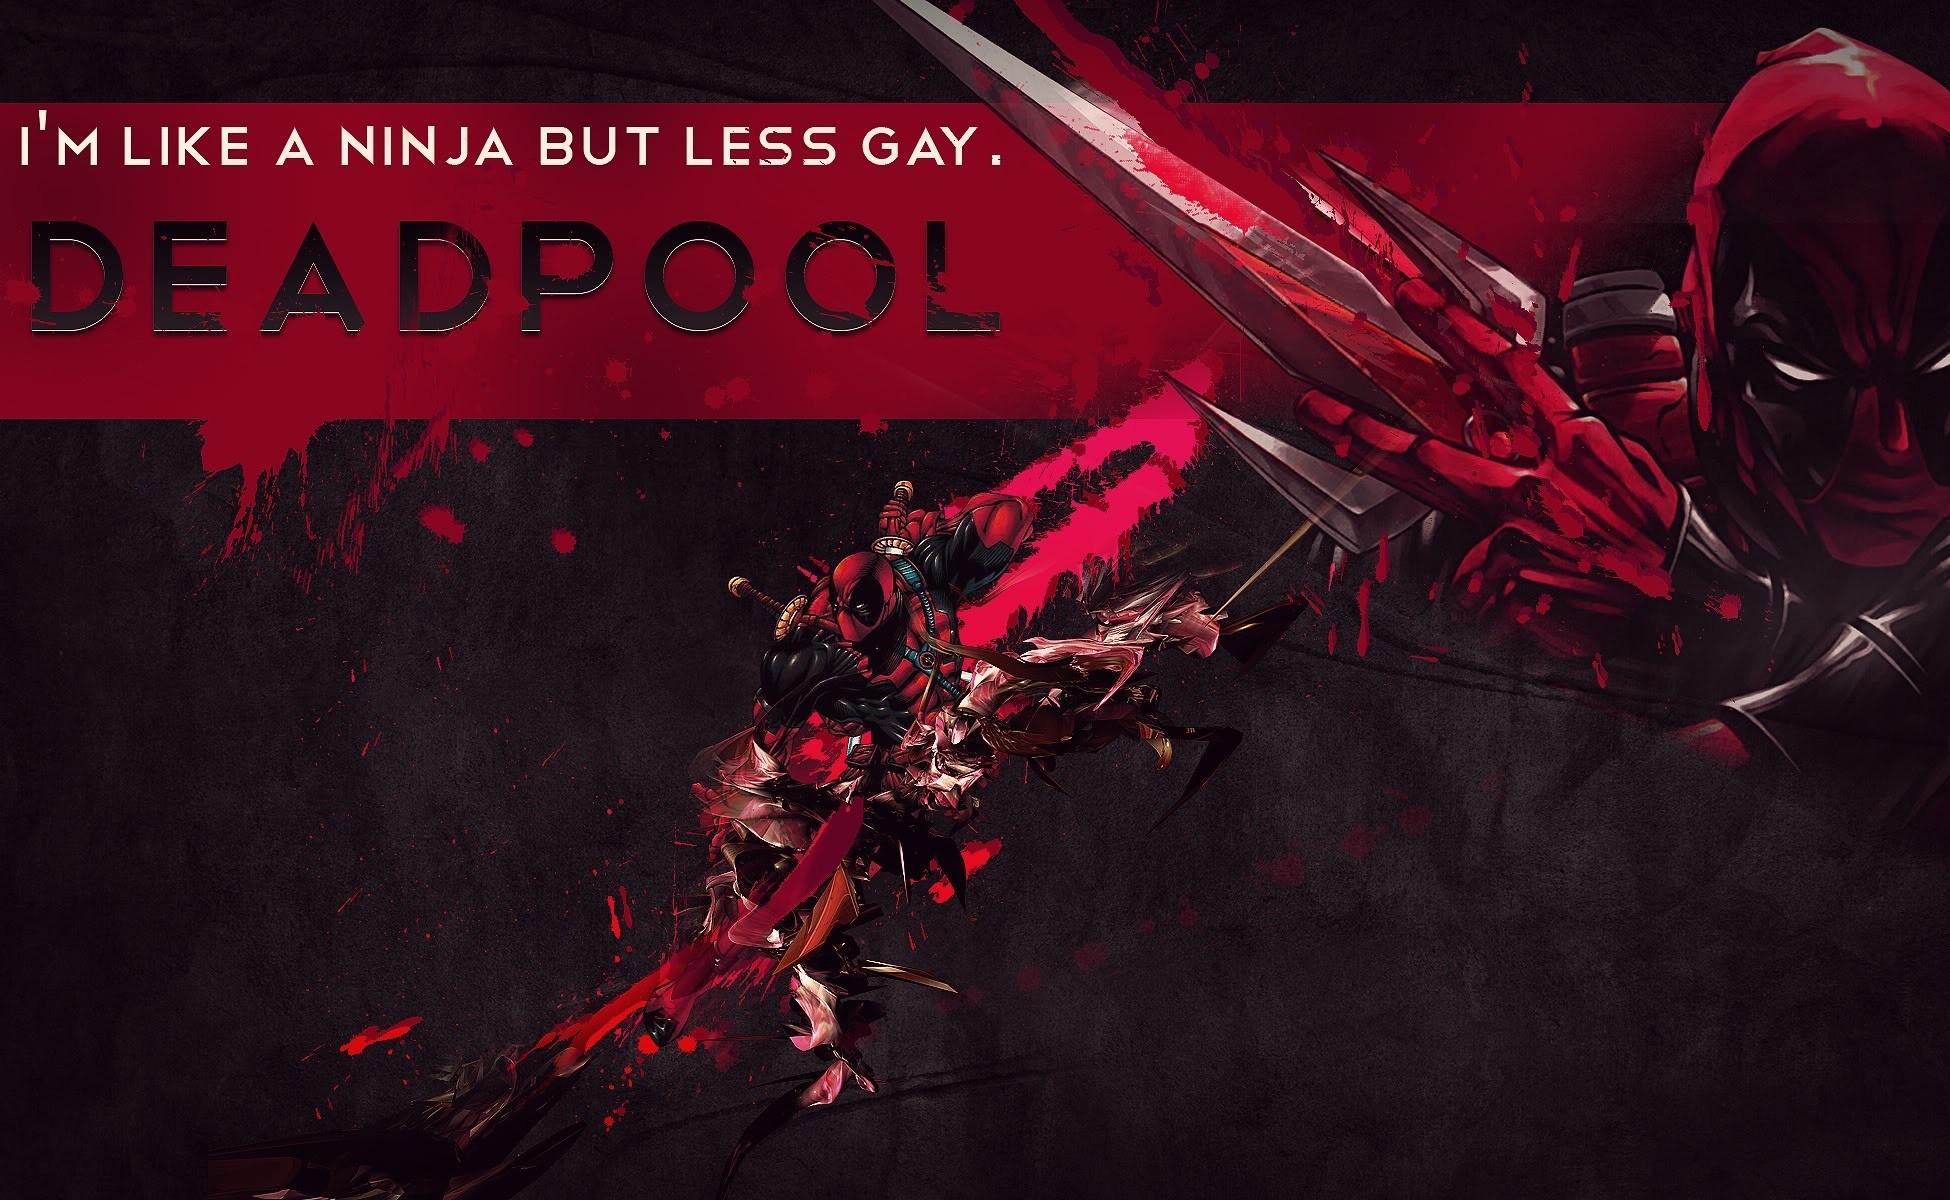 Deadpool free wallpapers